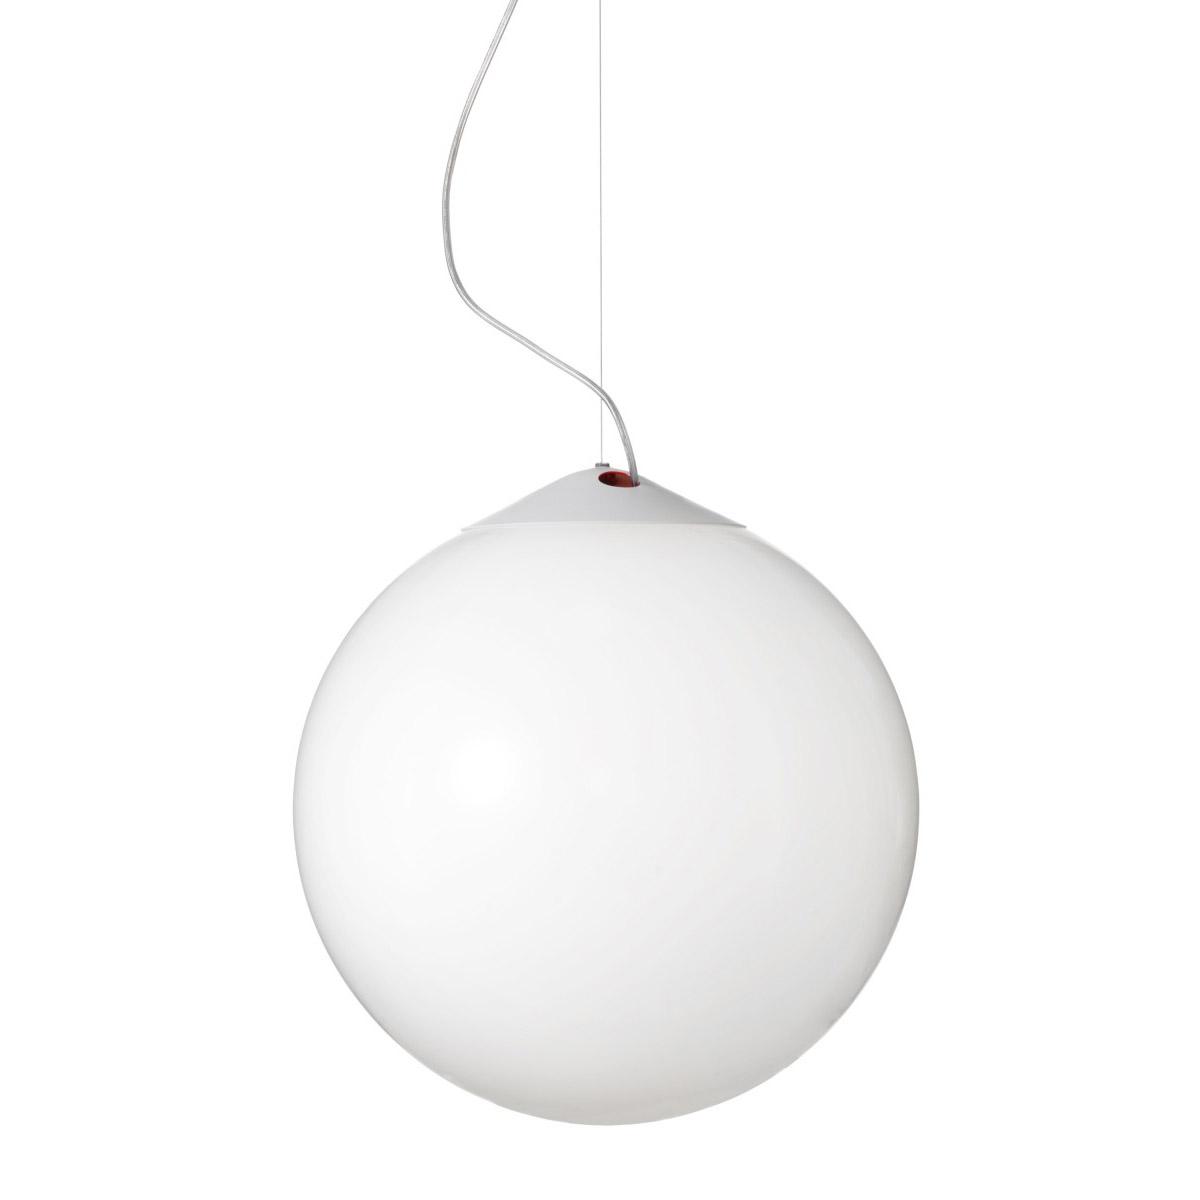 Örsjö DROPLIGHT Ø400 Matt vit/matt opalglas